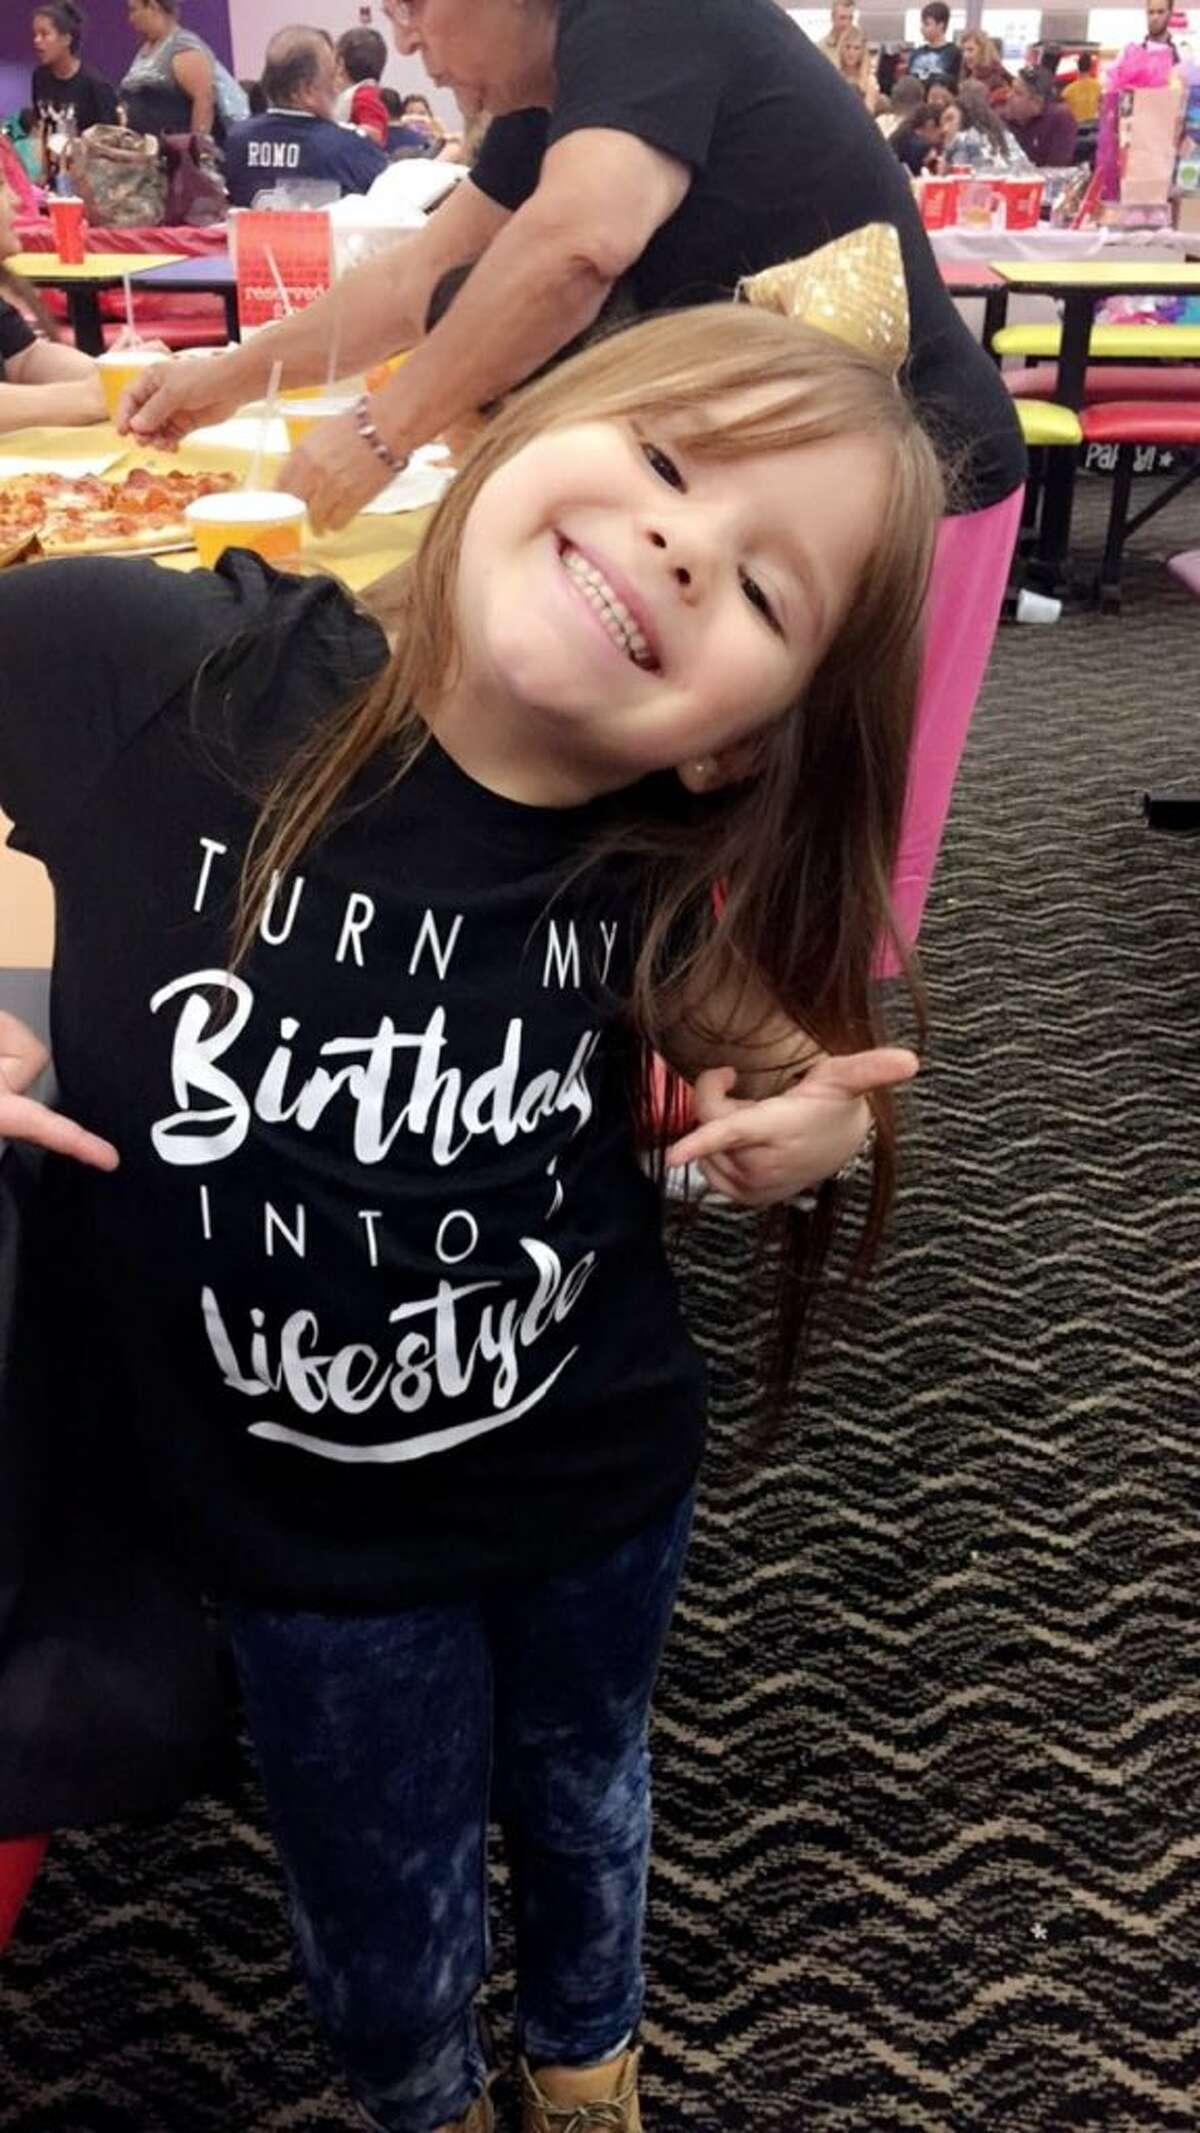 For her 6th birthday, Leah Saldivar from San Antonio, celebrated Drake-style.